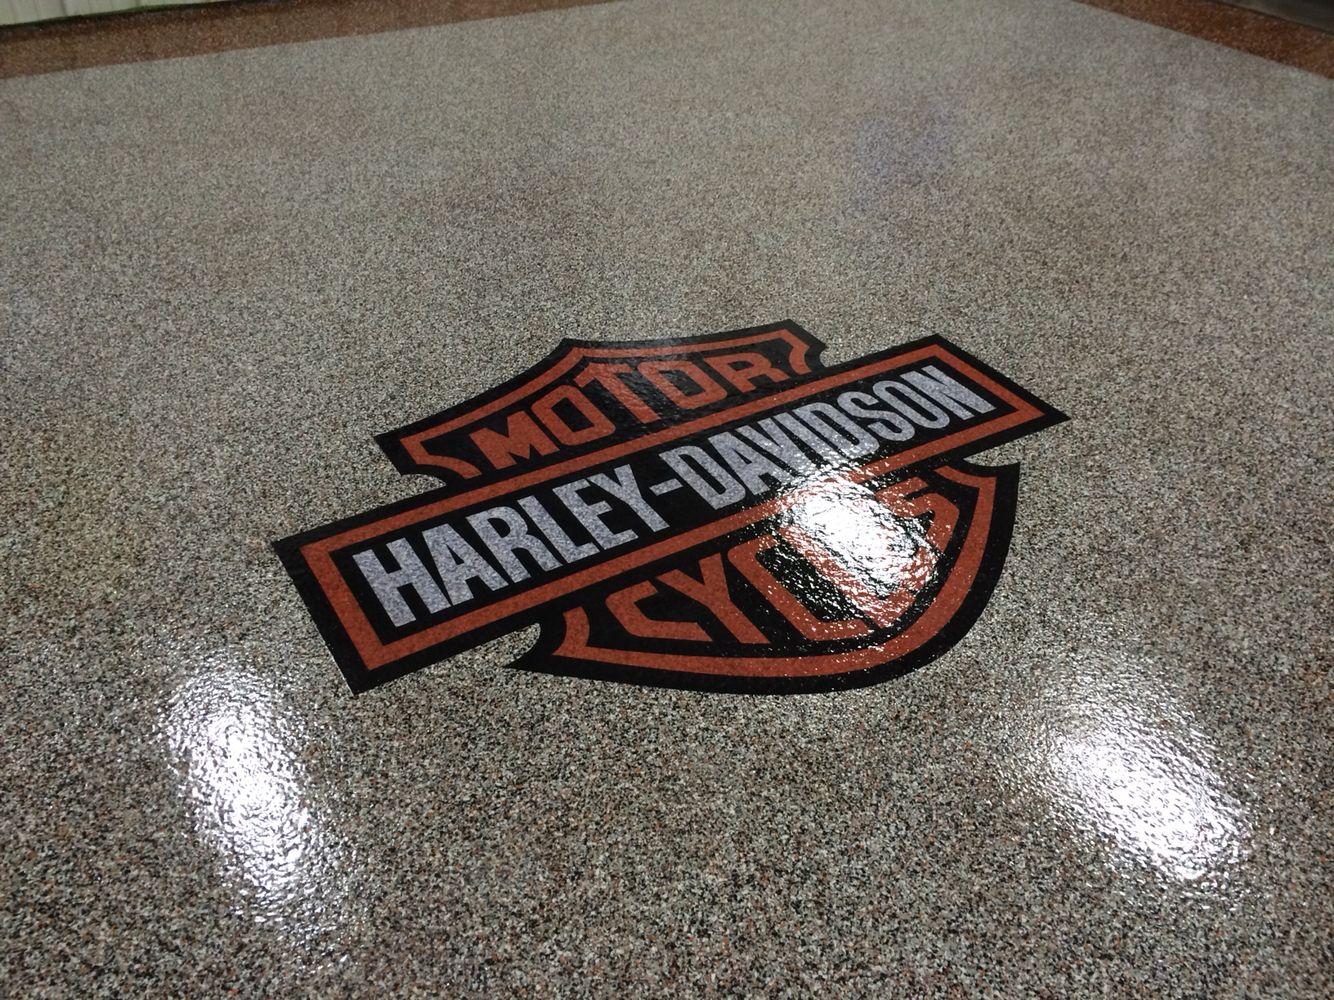 Epoxy Chip Garage Floor With Harley Davidson Logo Installed By Re Deck Of Northwest Ohio Lima Ohio Www Redeck Epoxy Floor Tile Floor Living Room Garage Floor [ 1000 x 1334 Pixel ]